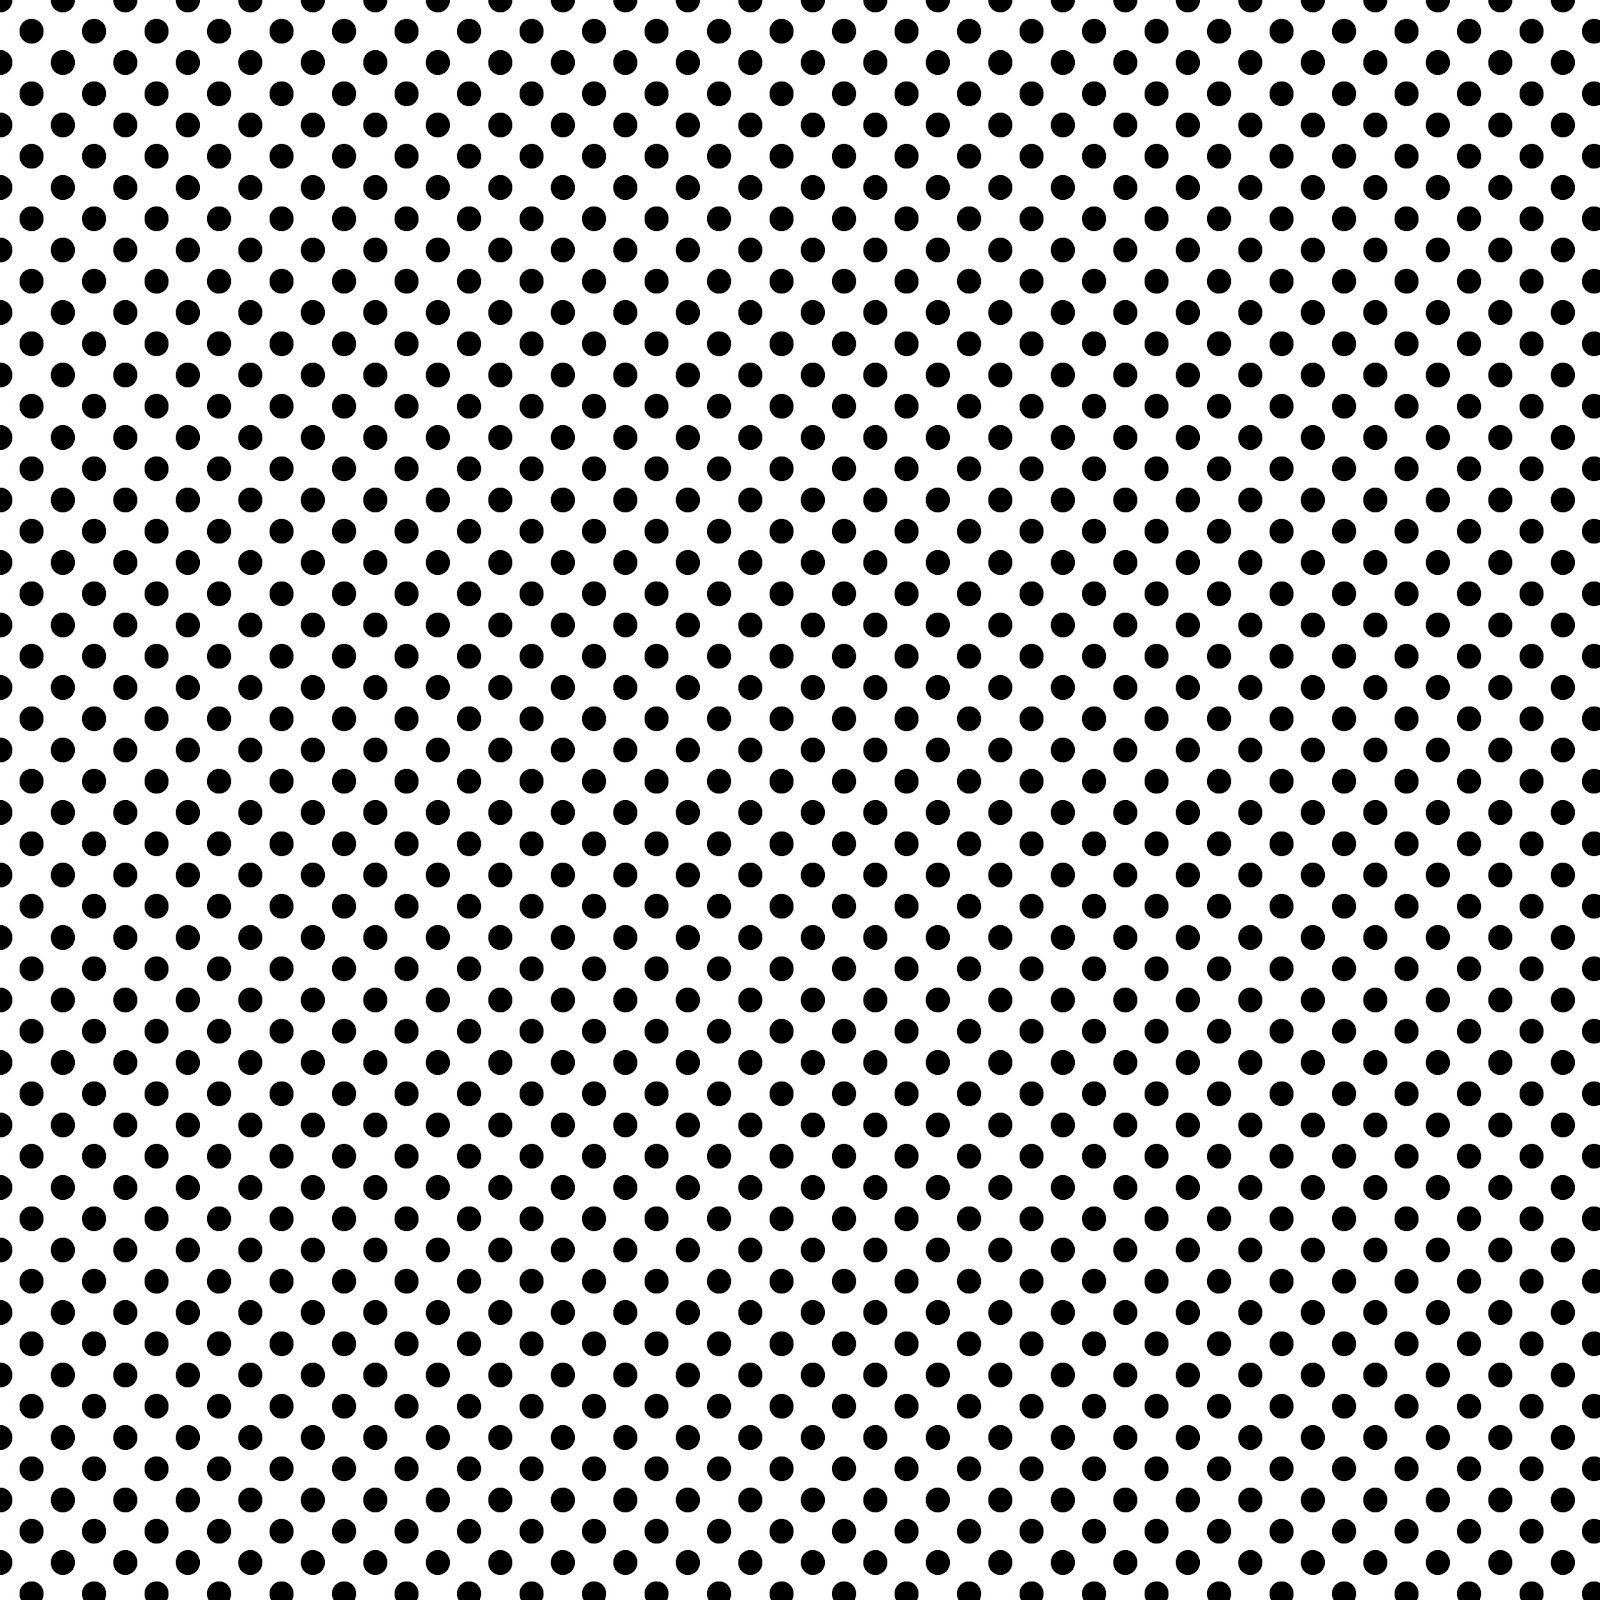 Dot Black And White Black Dots Dots Polka Dots Bla